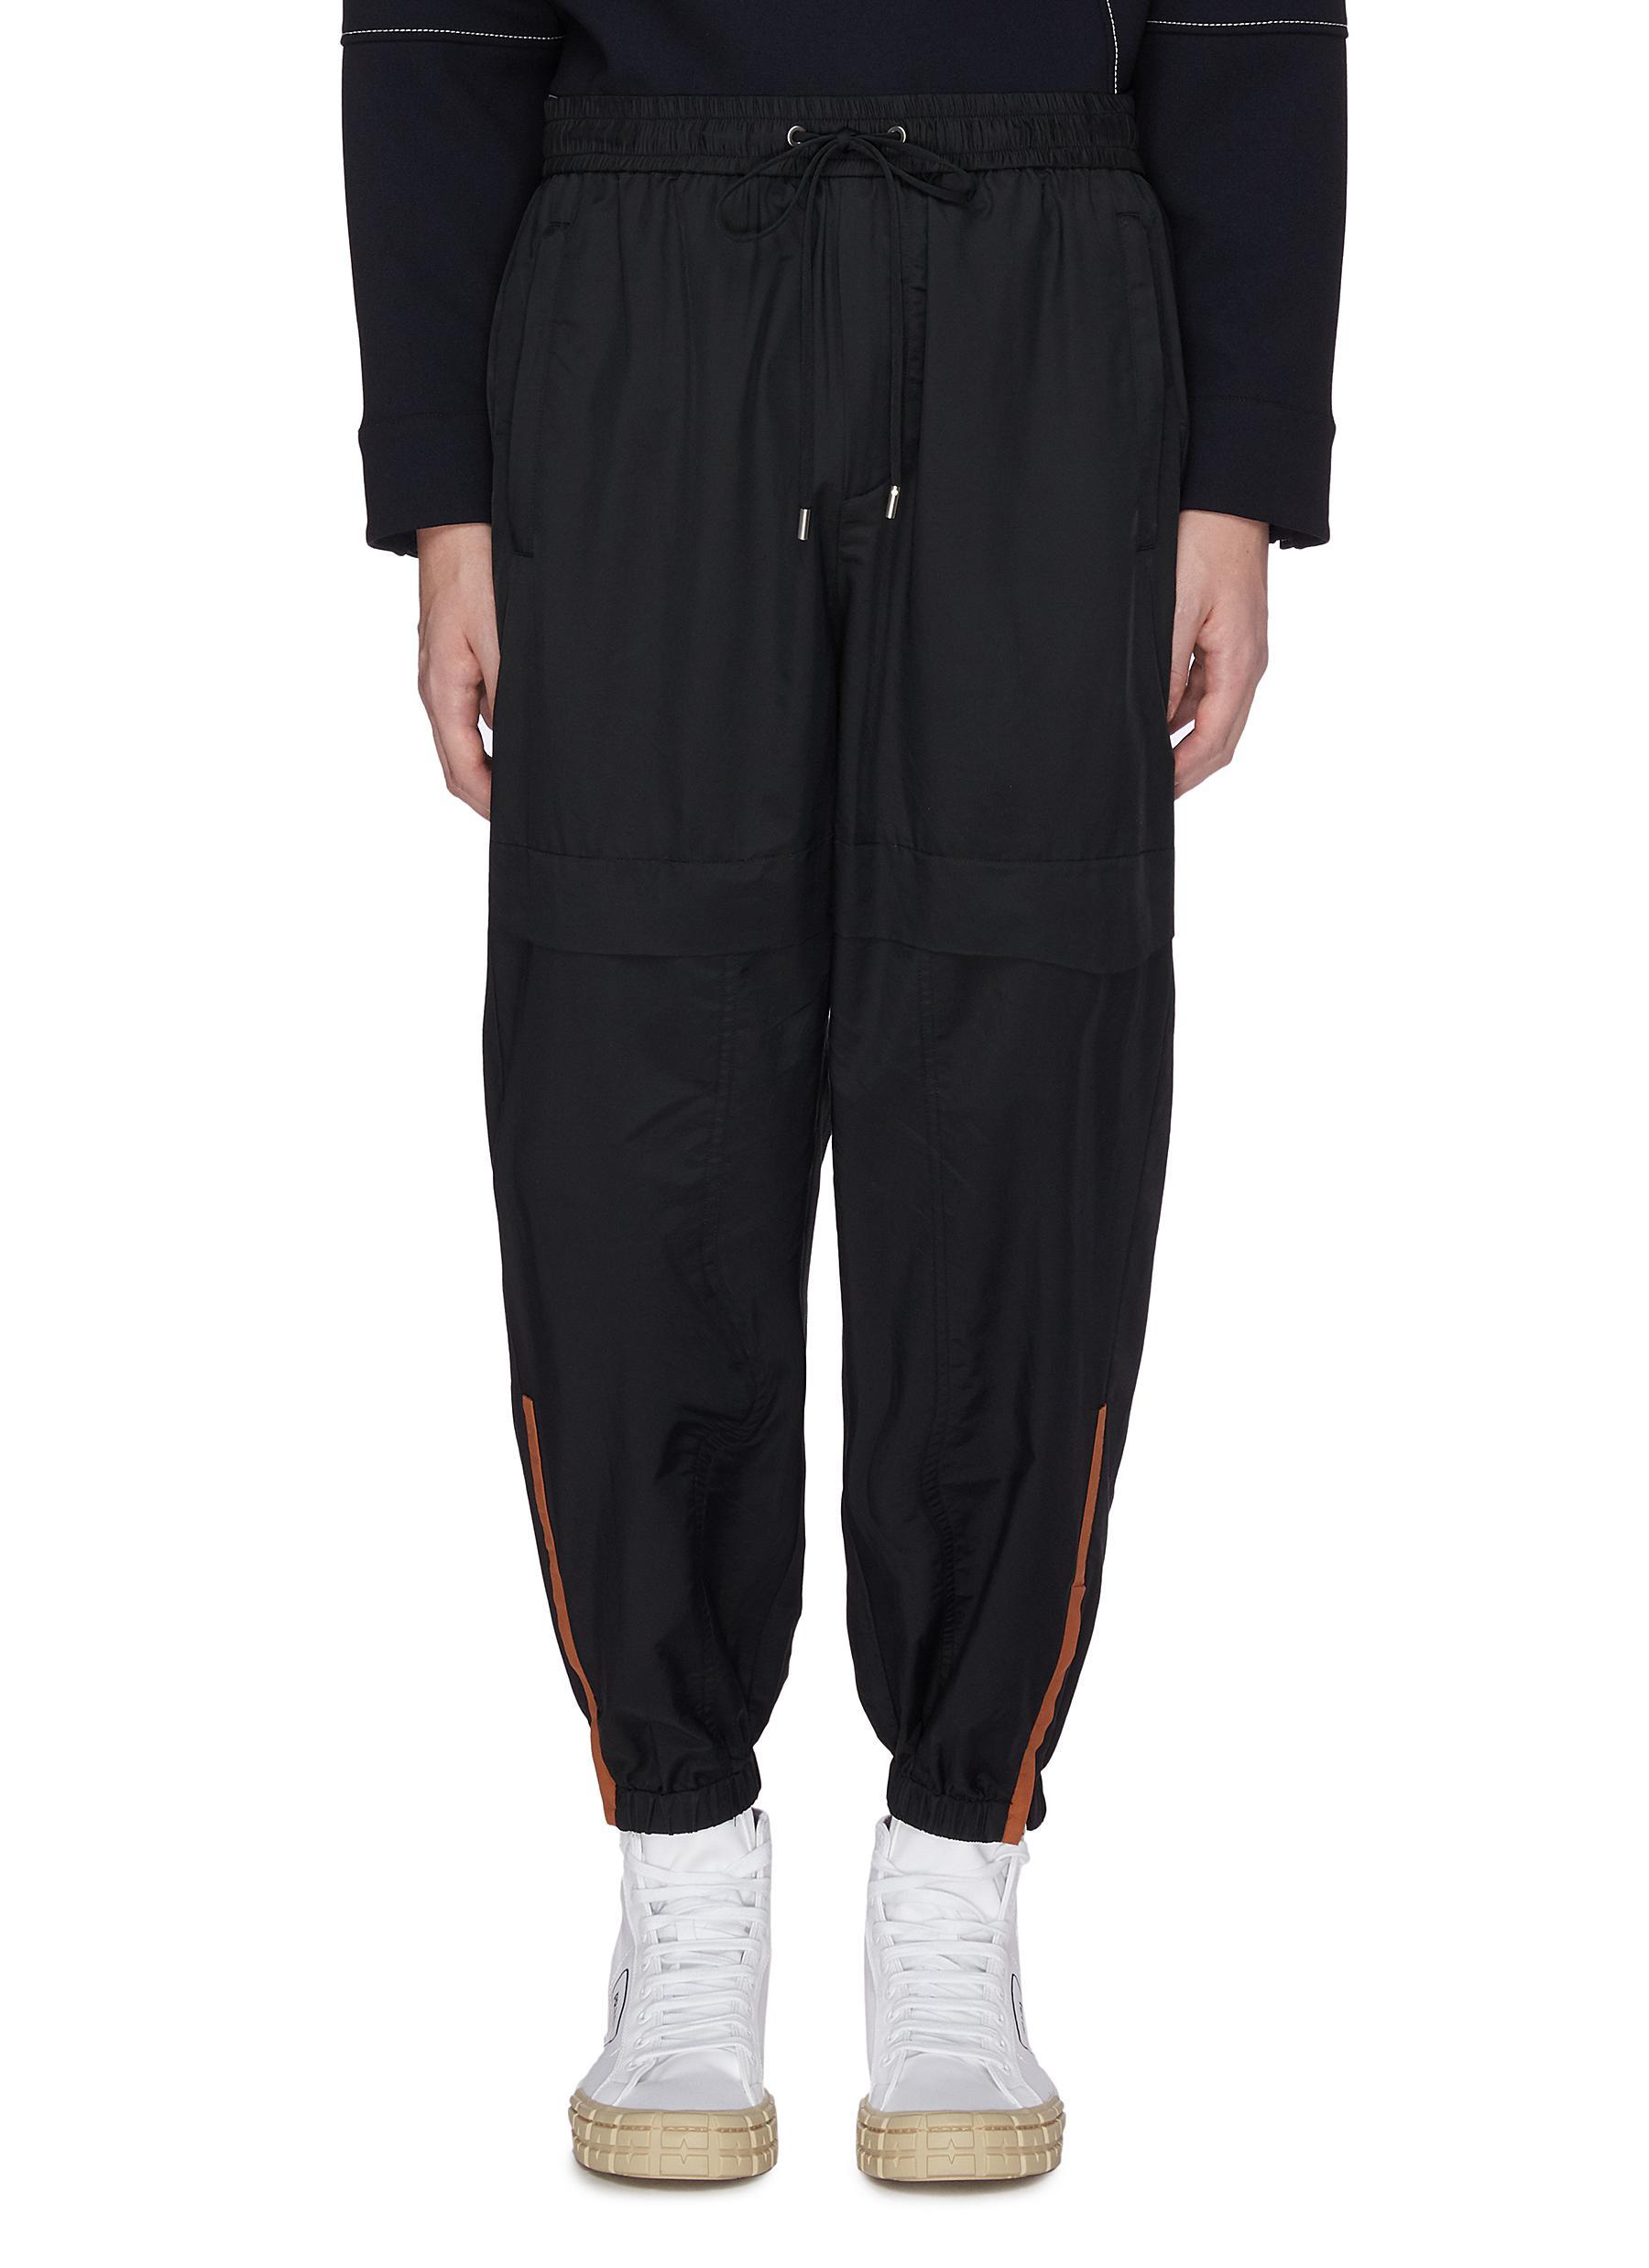 Side stripe jogging pants - 3.1 PHILLIP LIM - Modalova